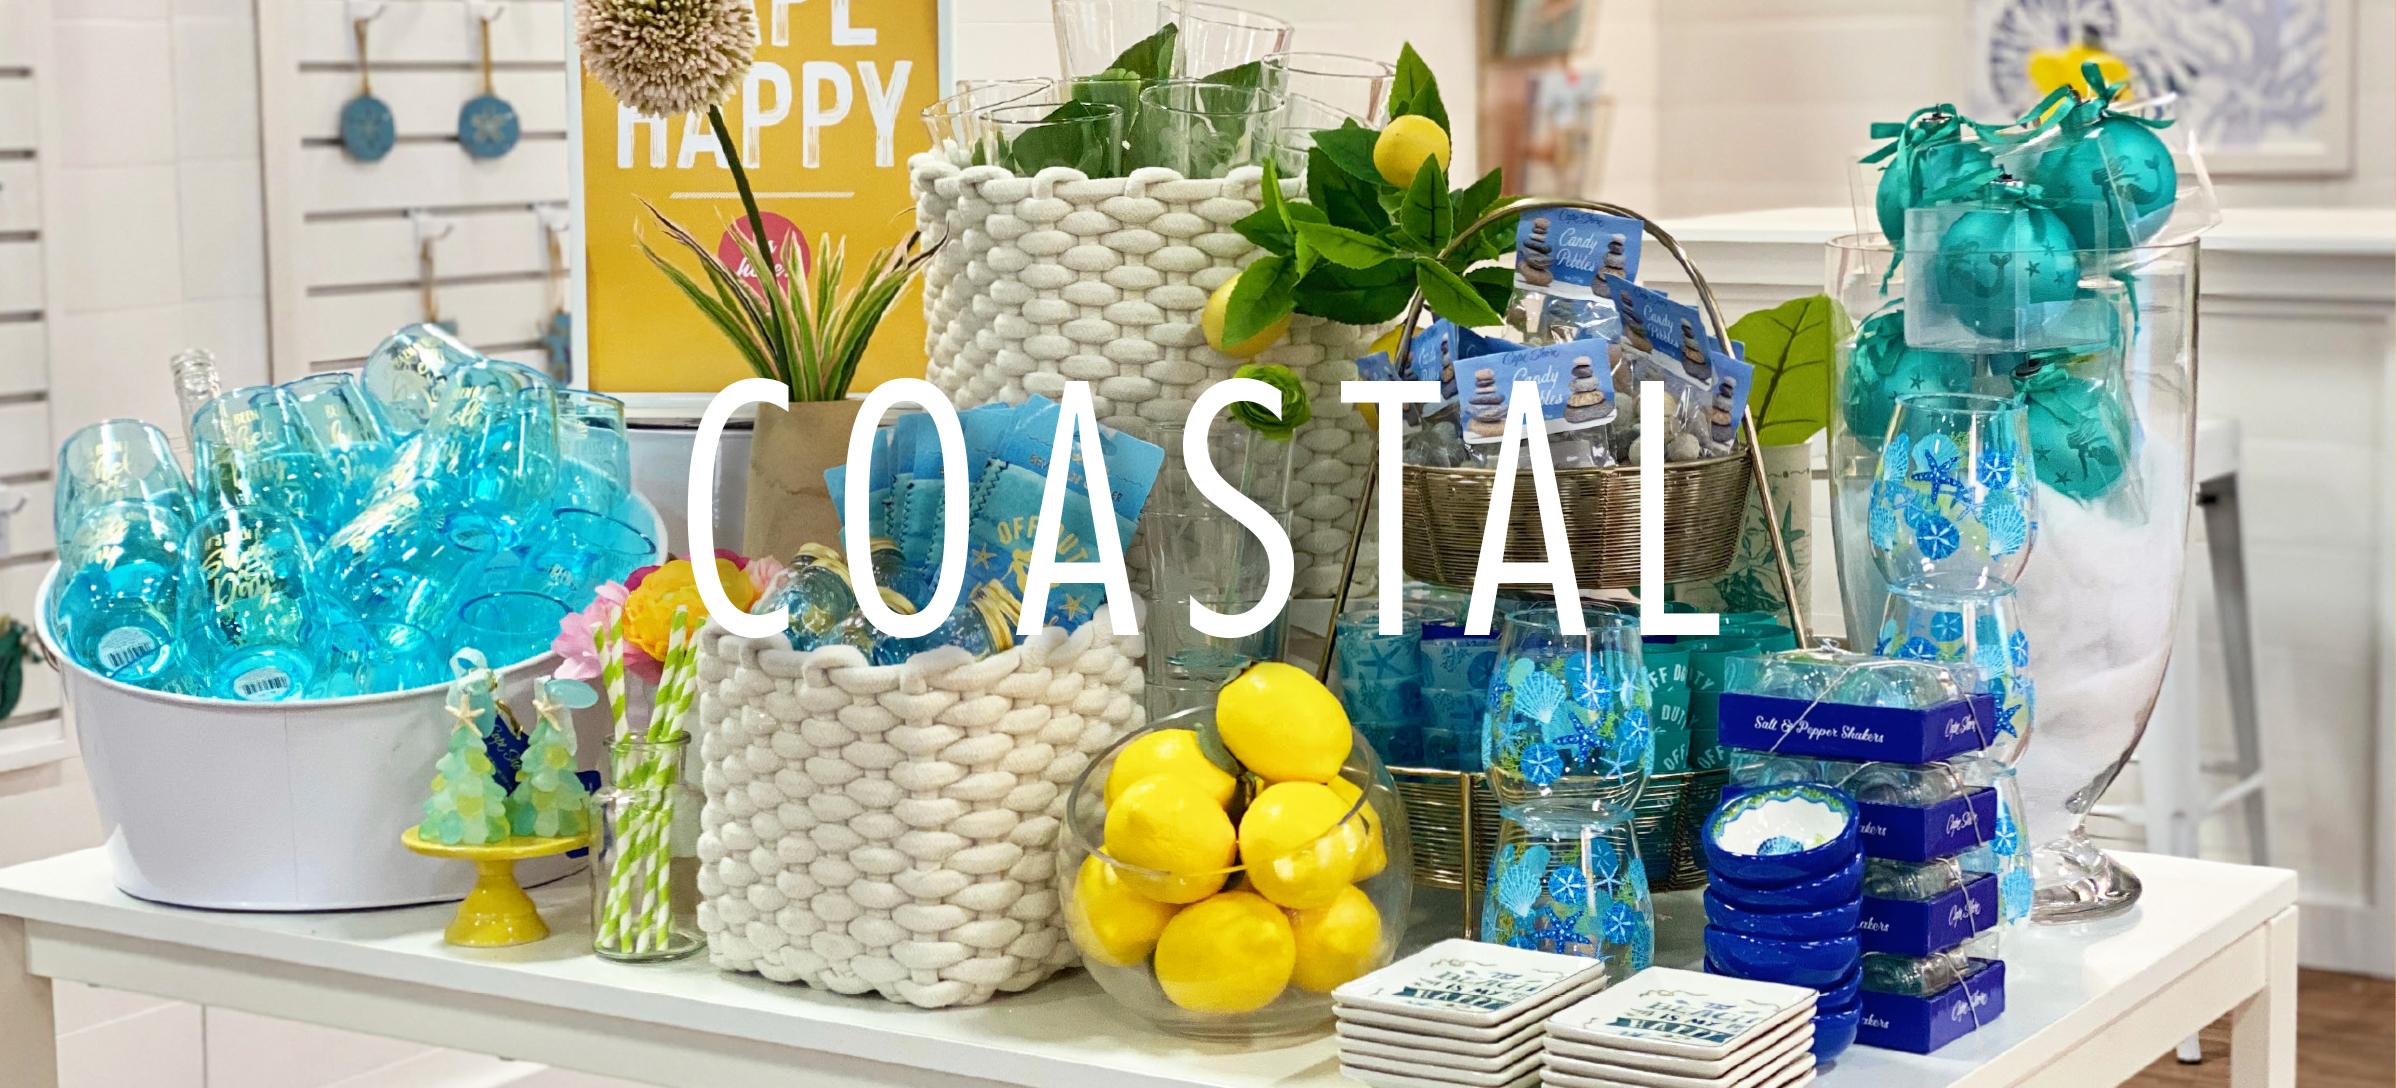 Coastal Products